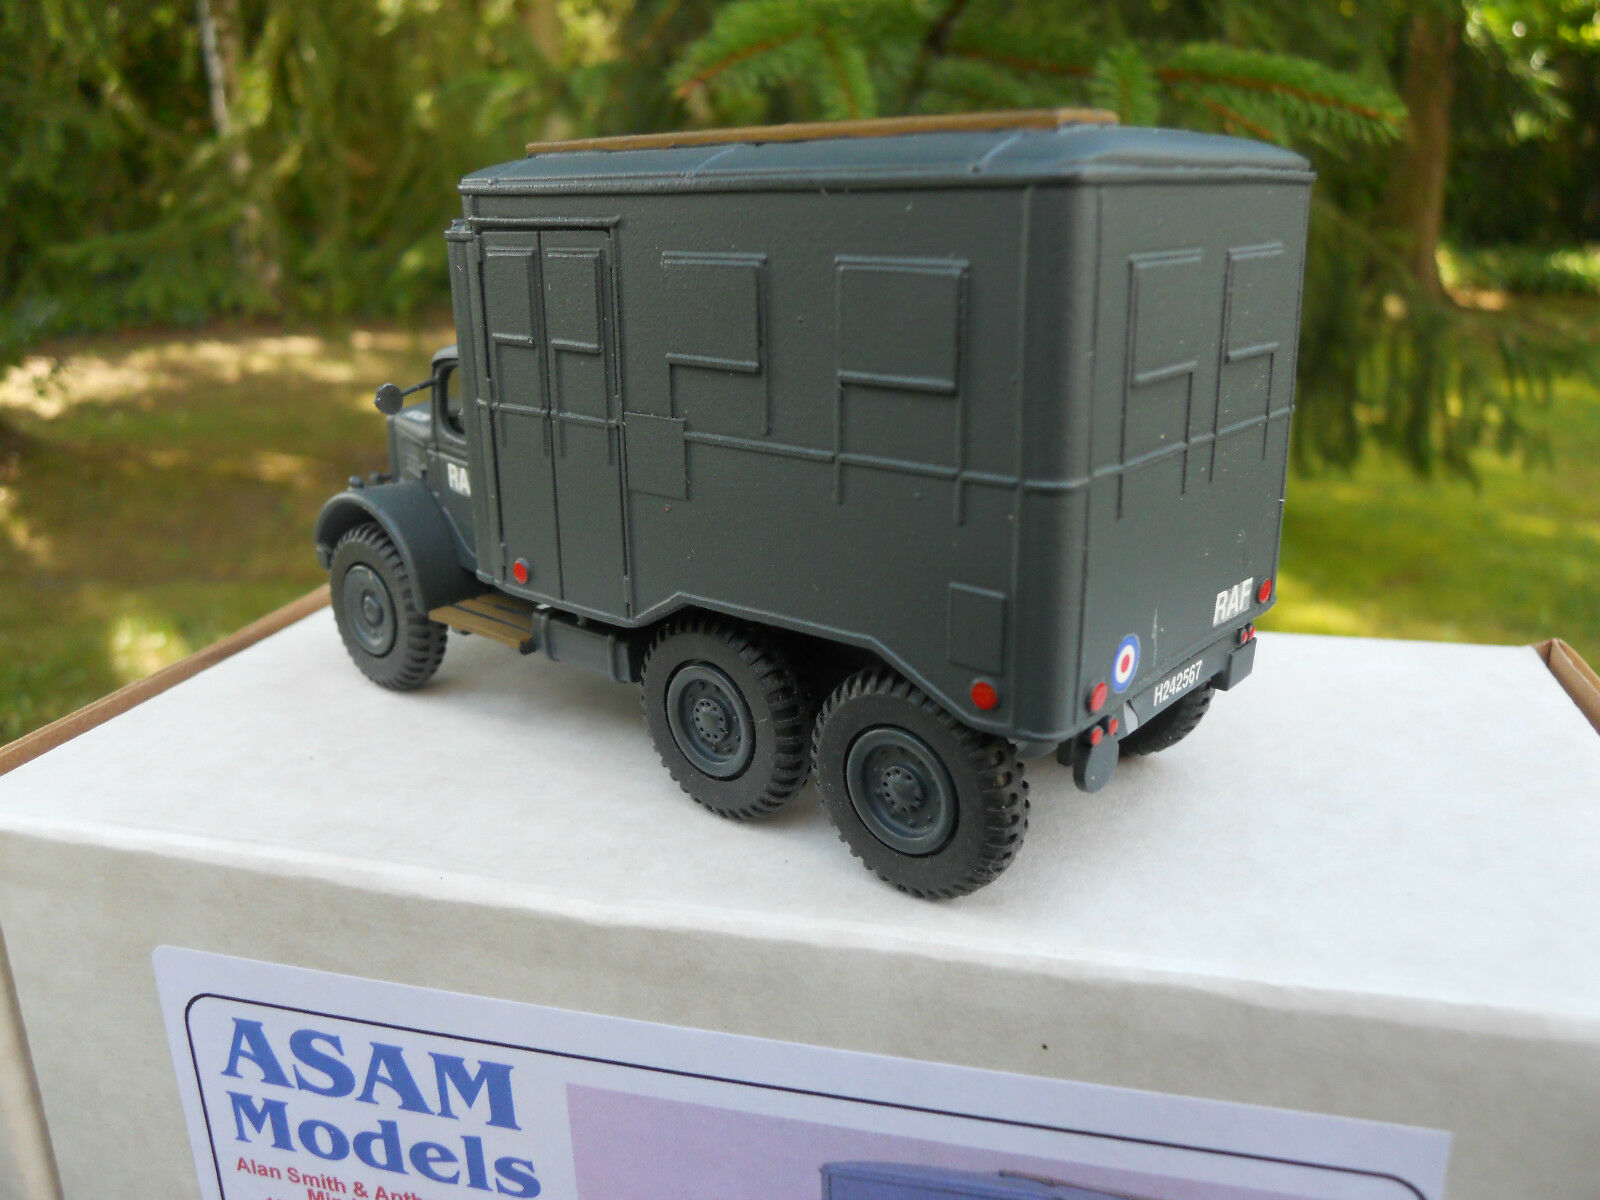 VEHICULE MILITAIRE ASAM MODELS MODELS MODELS AUSTIN K6  WORKSHOP RAF  MINT IN BOX e20a86